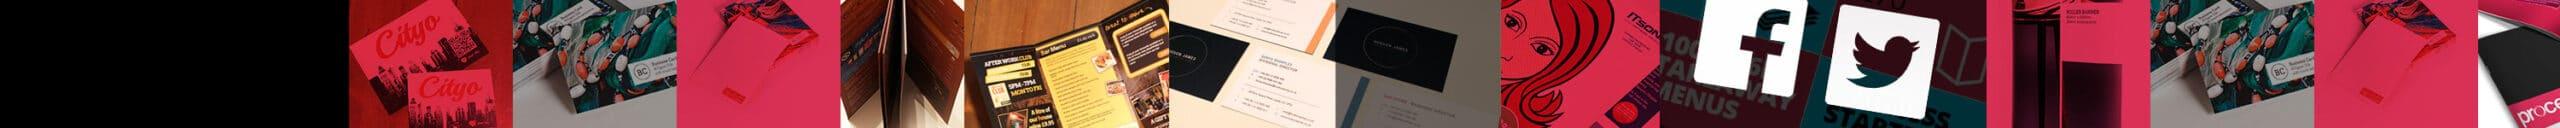 table talker printing york